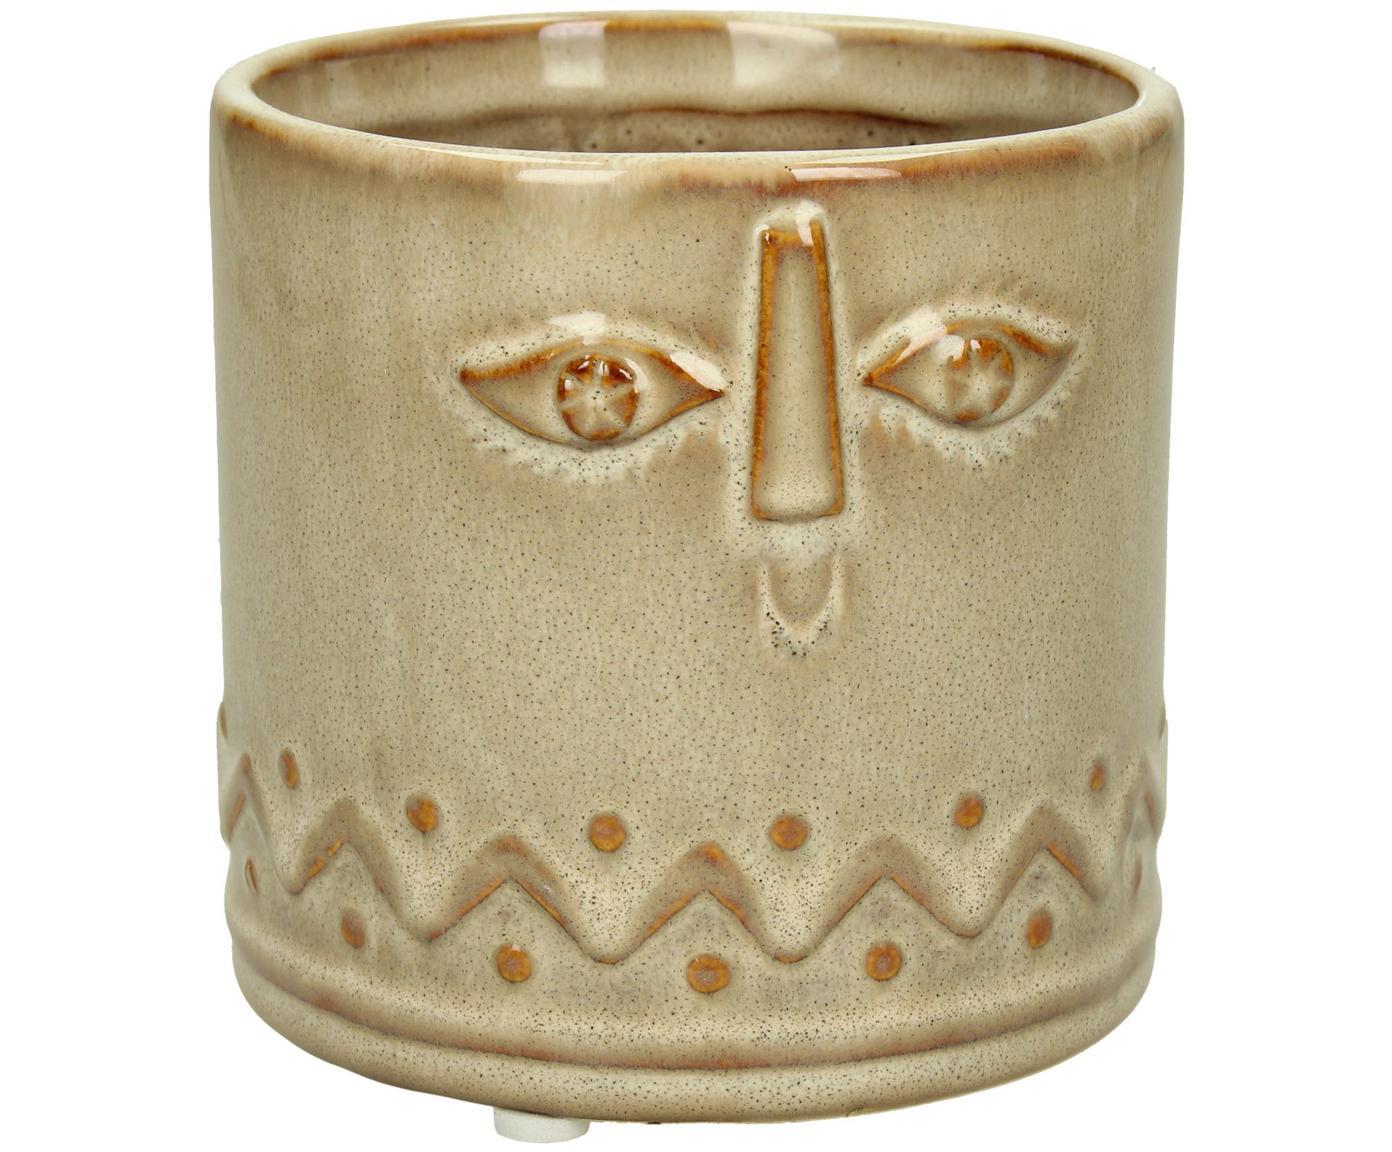 Übertopf Sandy, Keramik, Braun, Ø 12 x H 11 cm